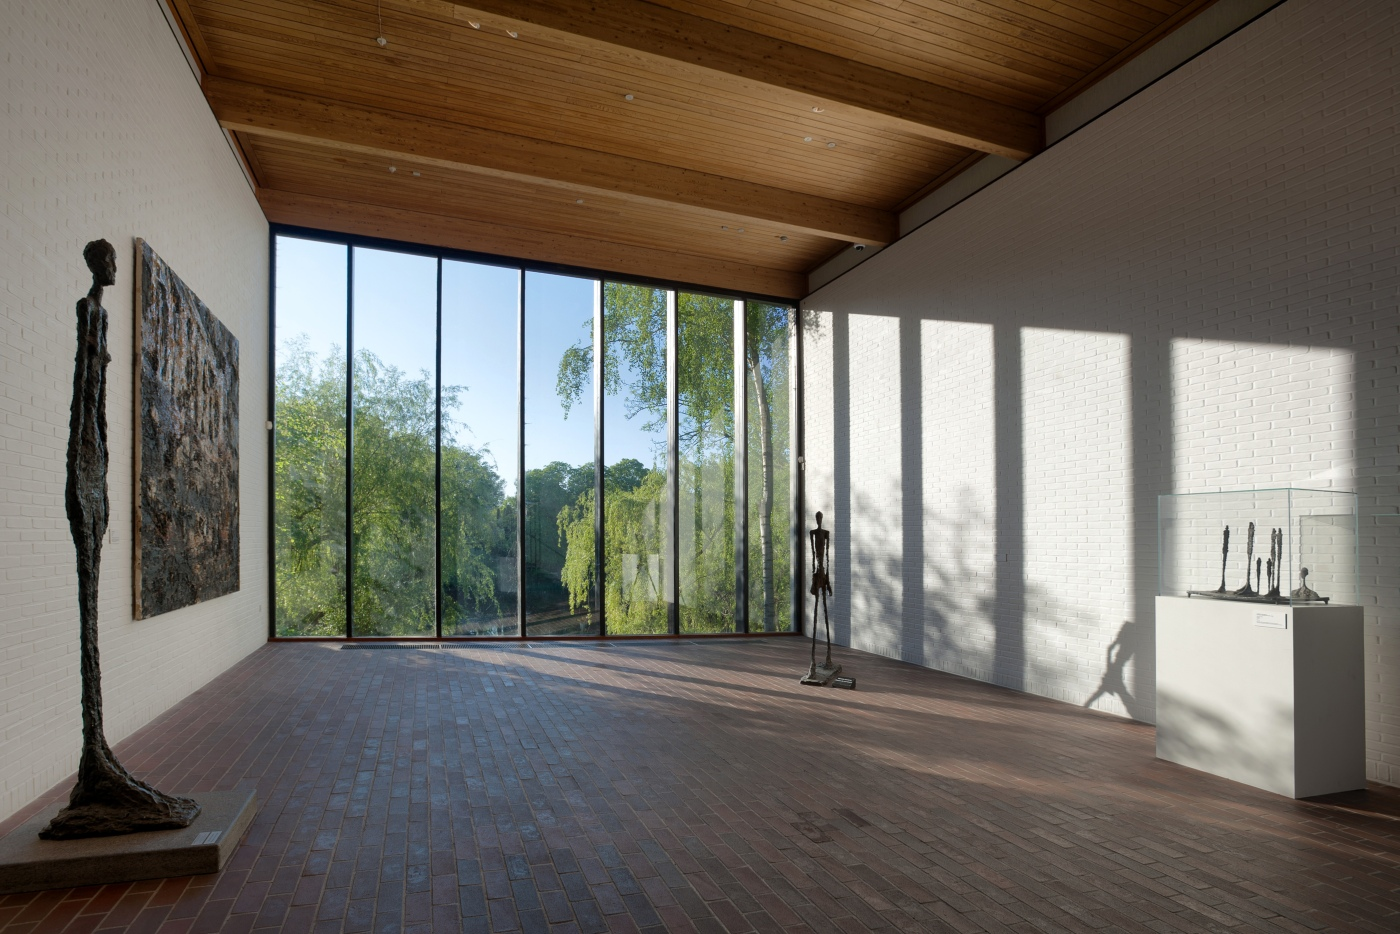 Giacometti salen med sent lysindfald